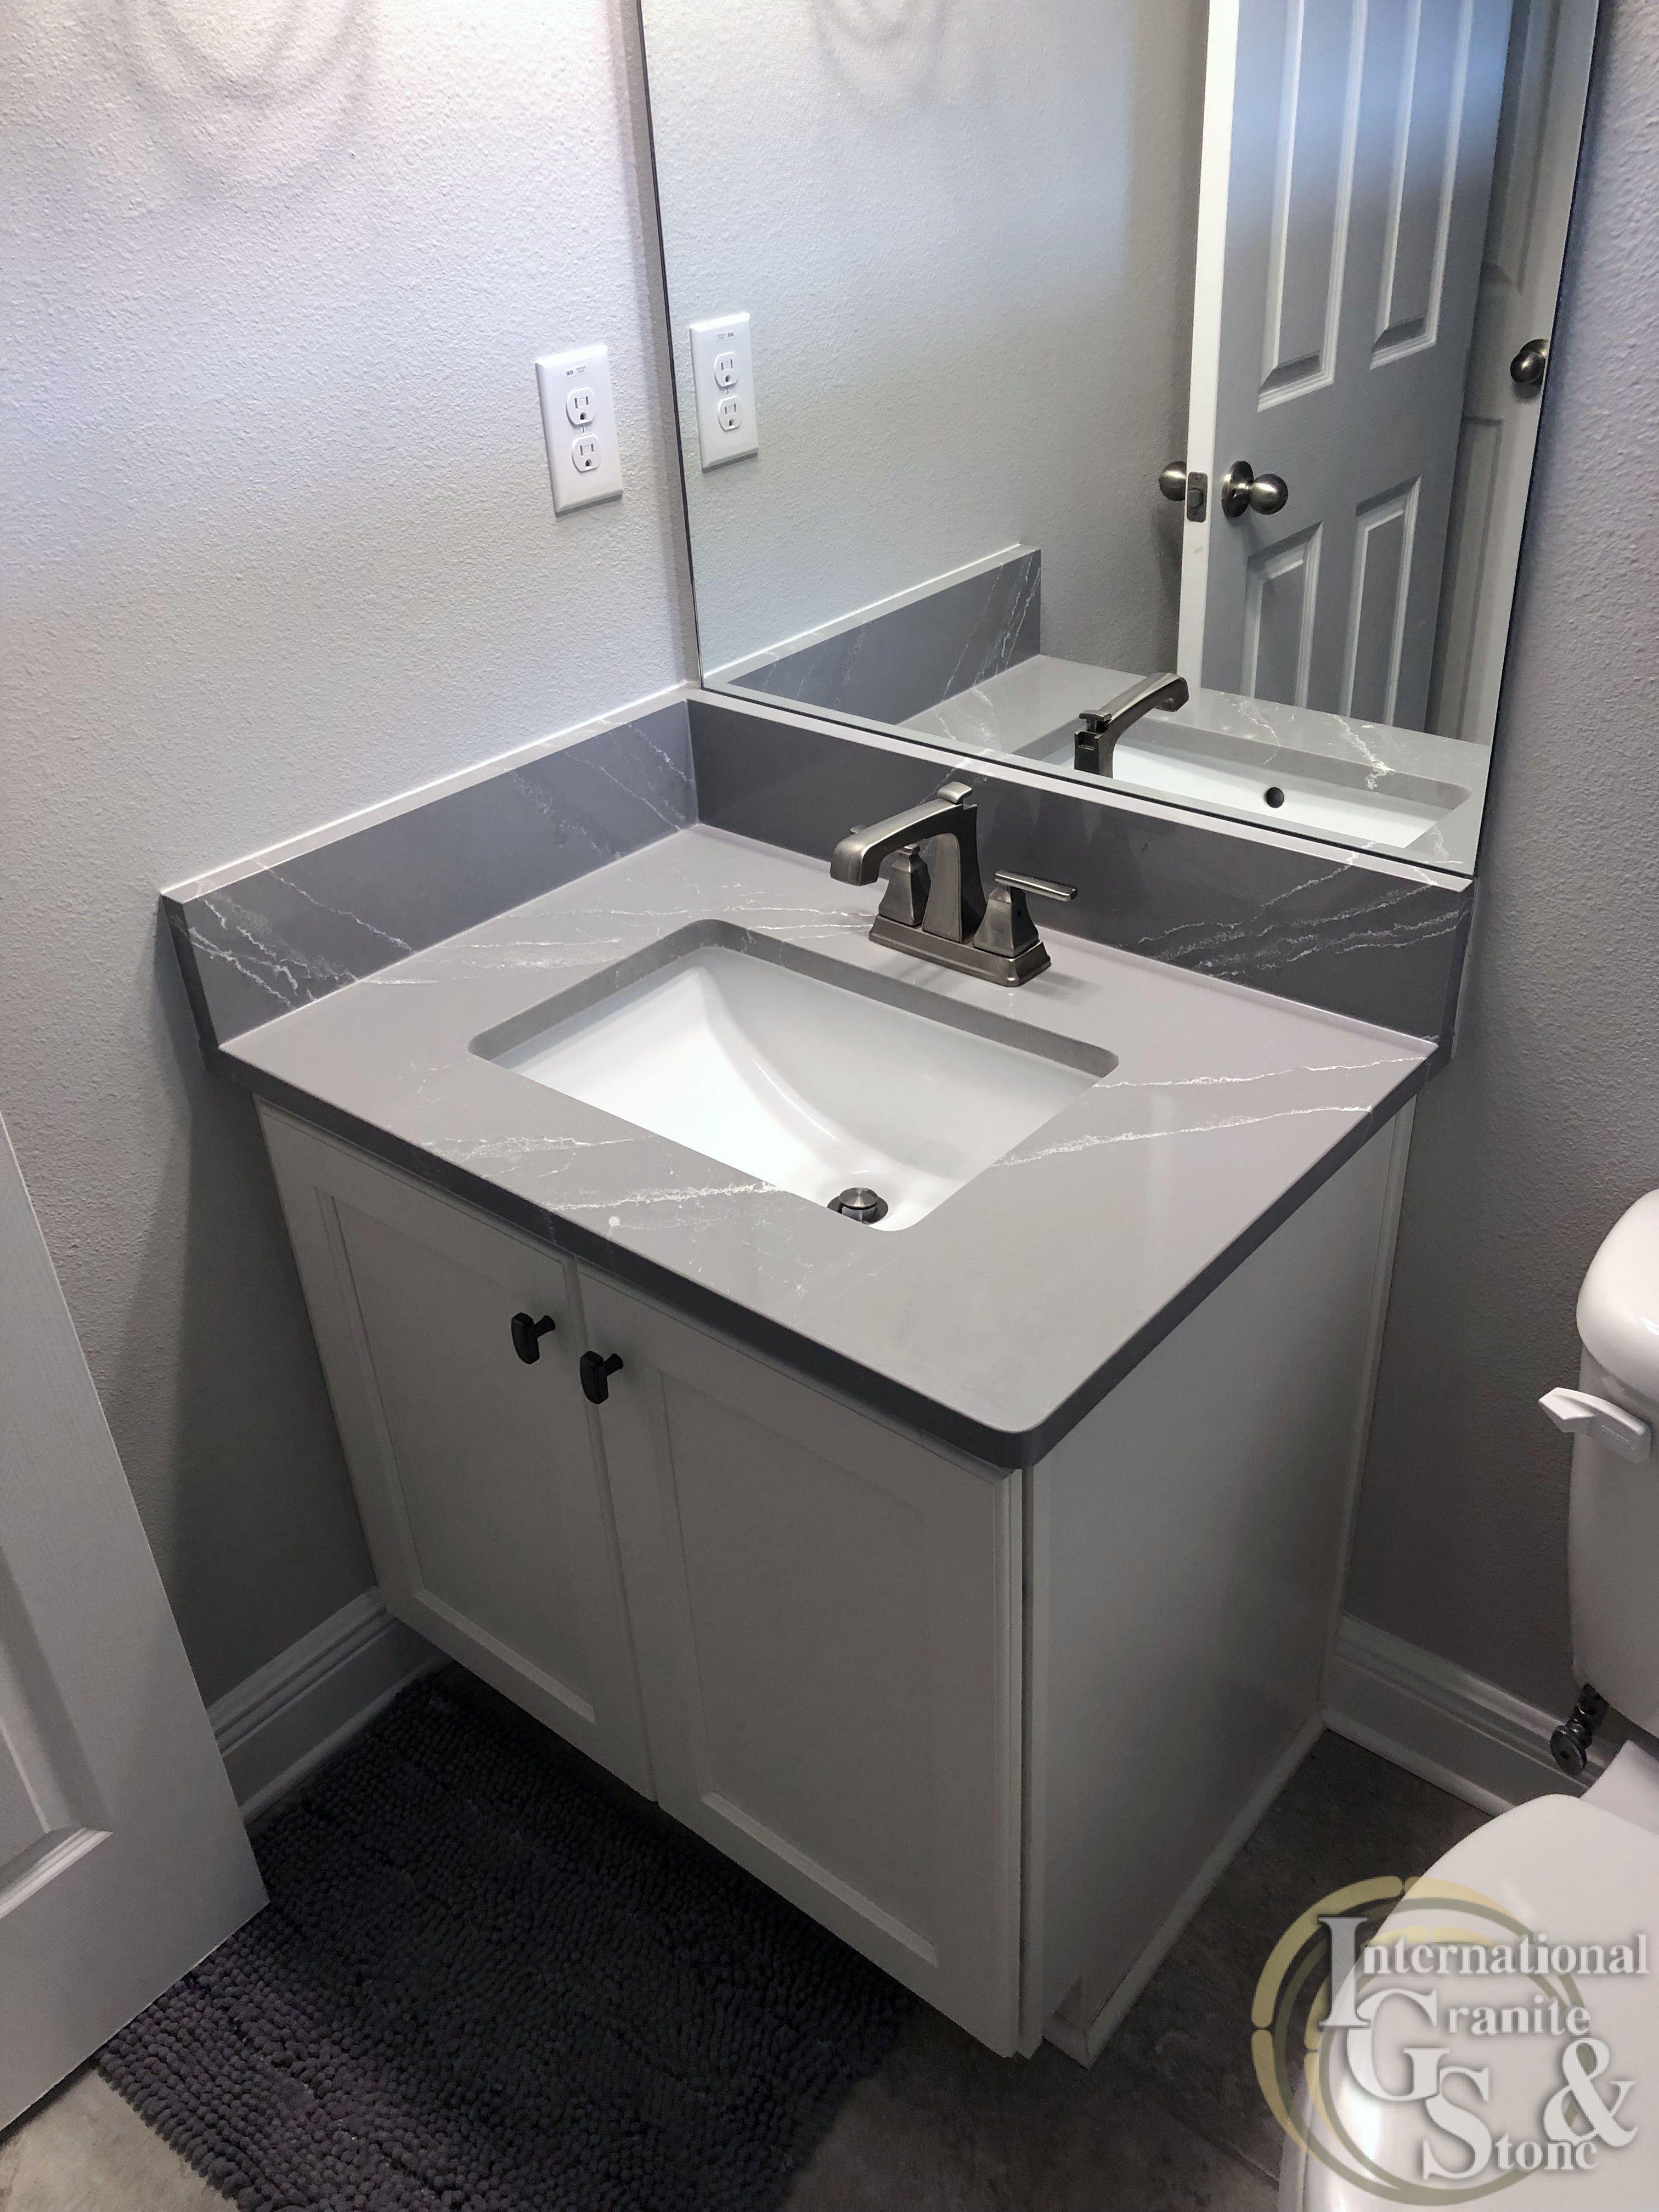 A Recent Cambria Queen Anne Quartz Bathroom Vanity Installation In